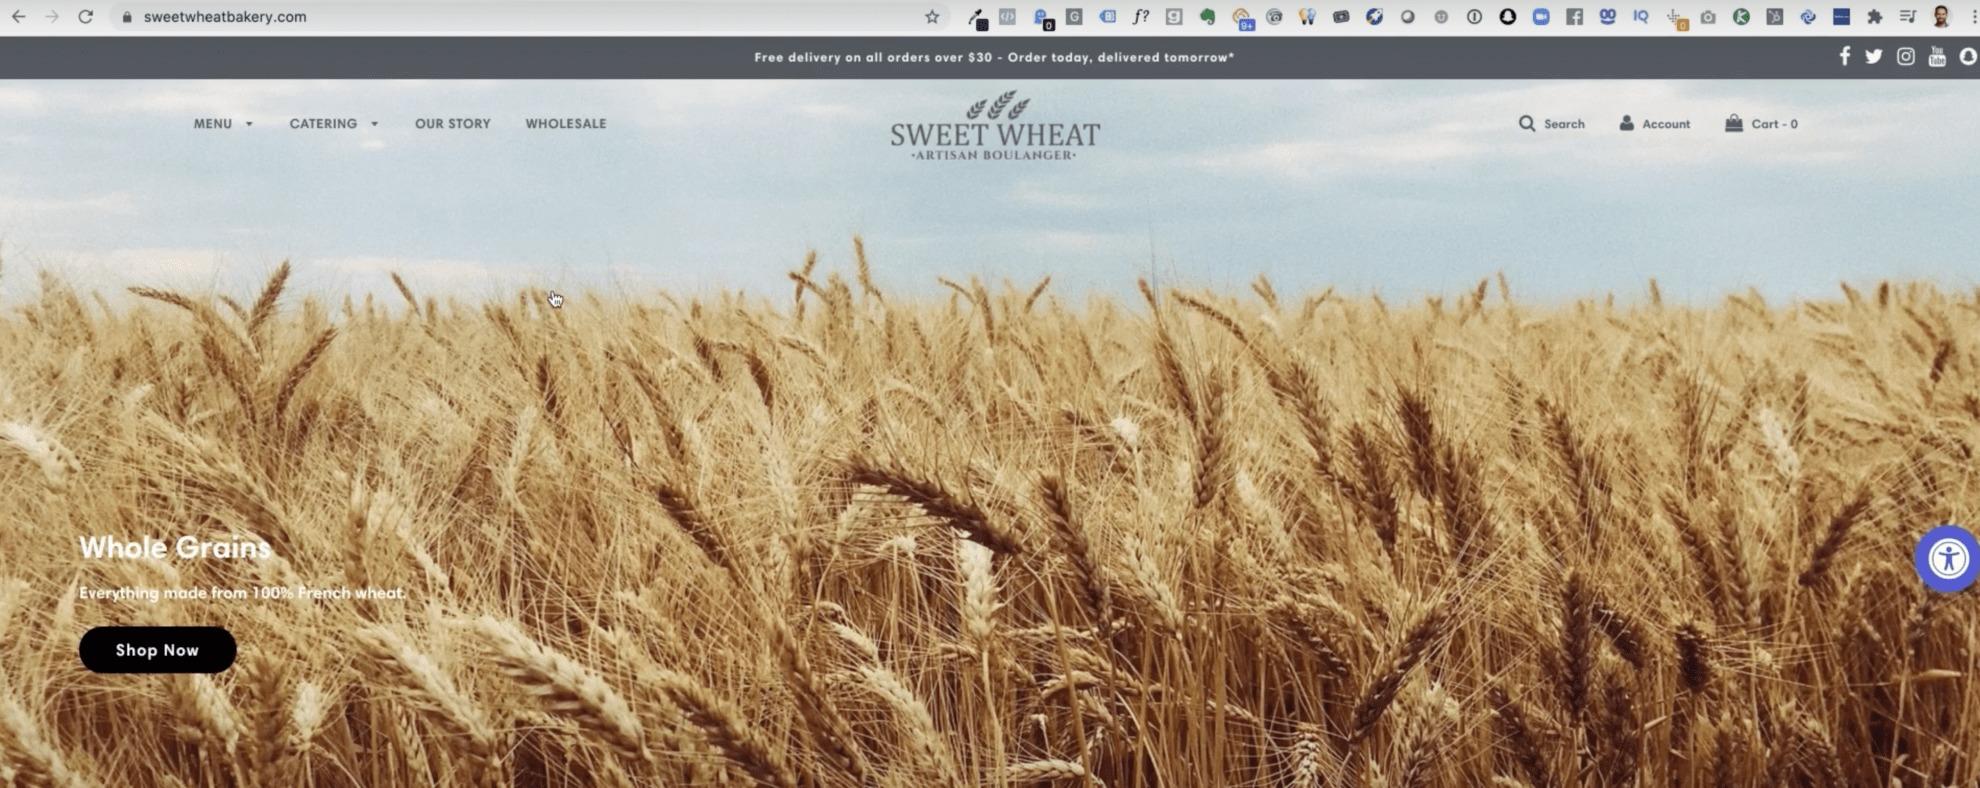 URL Targeting with Sweetheart Bakery